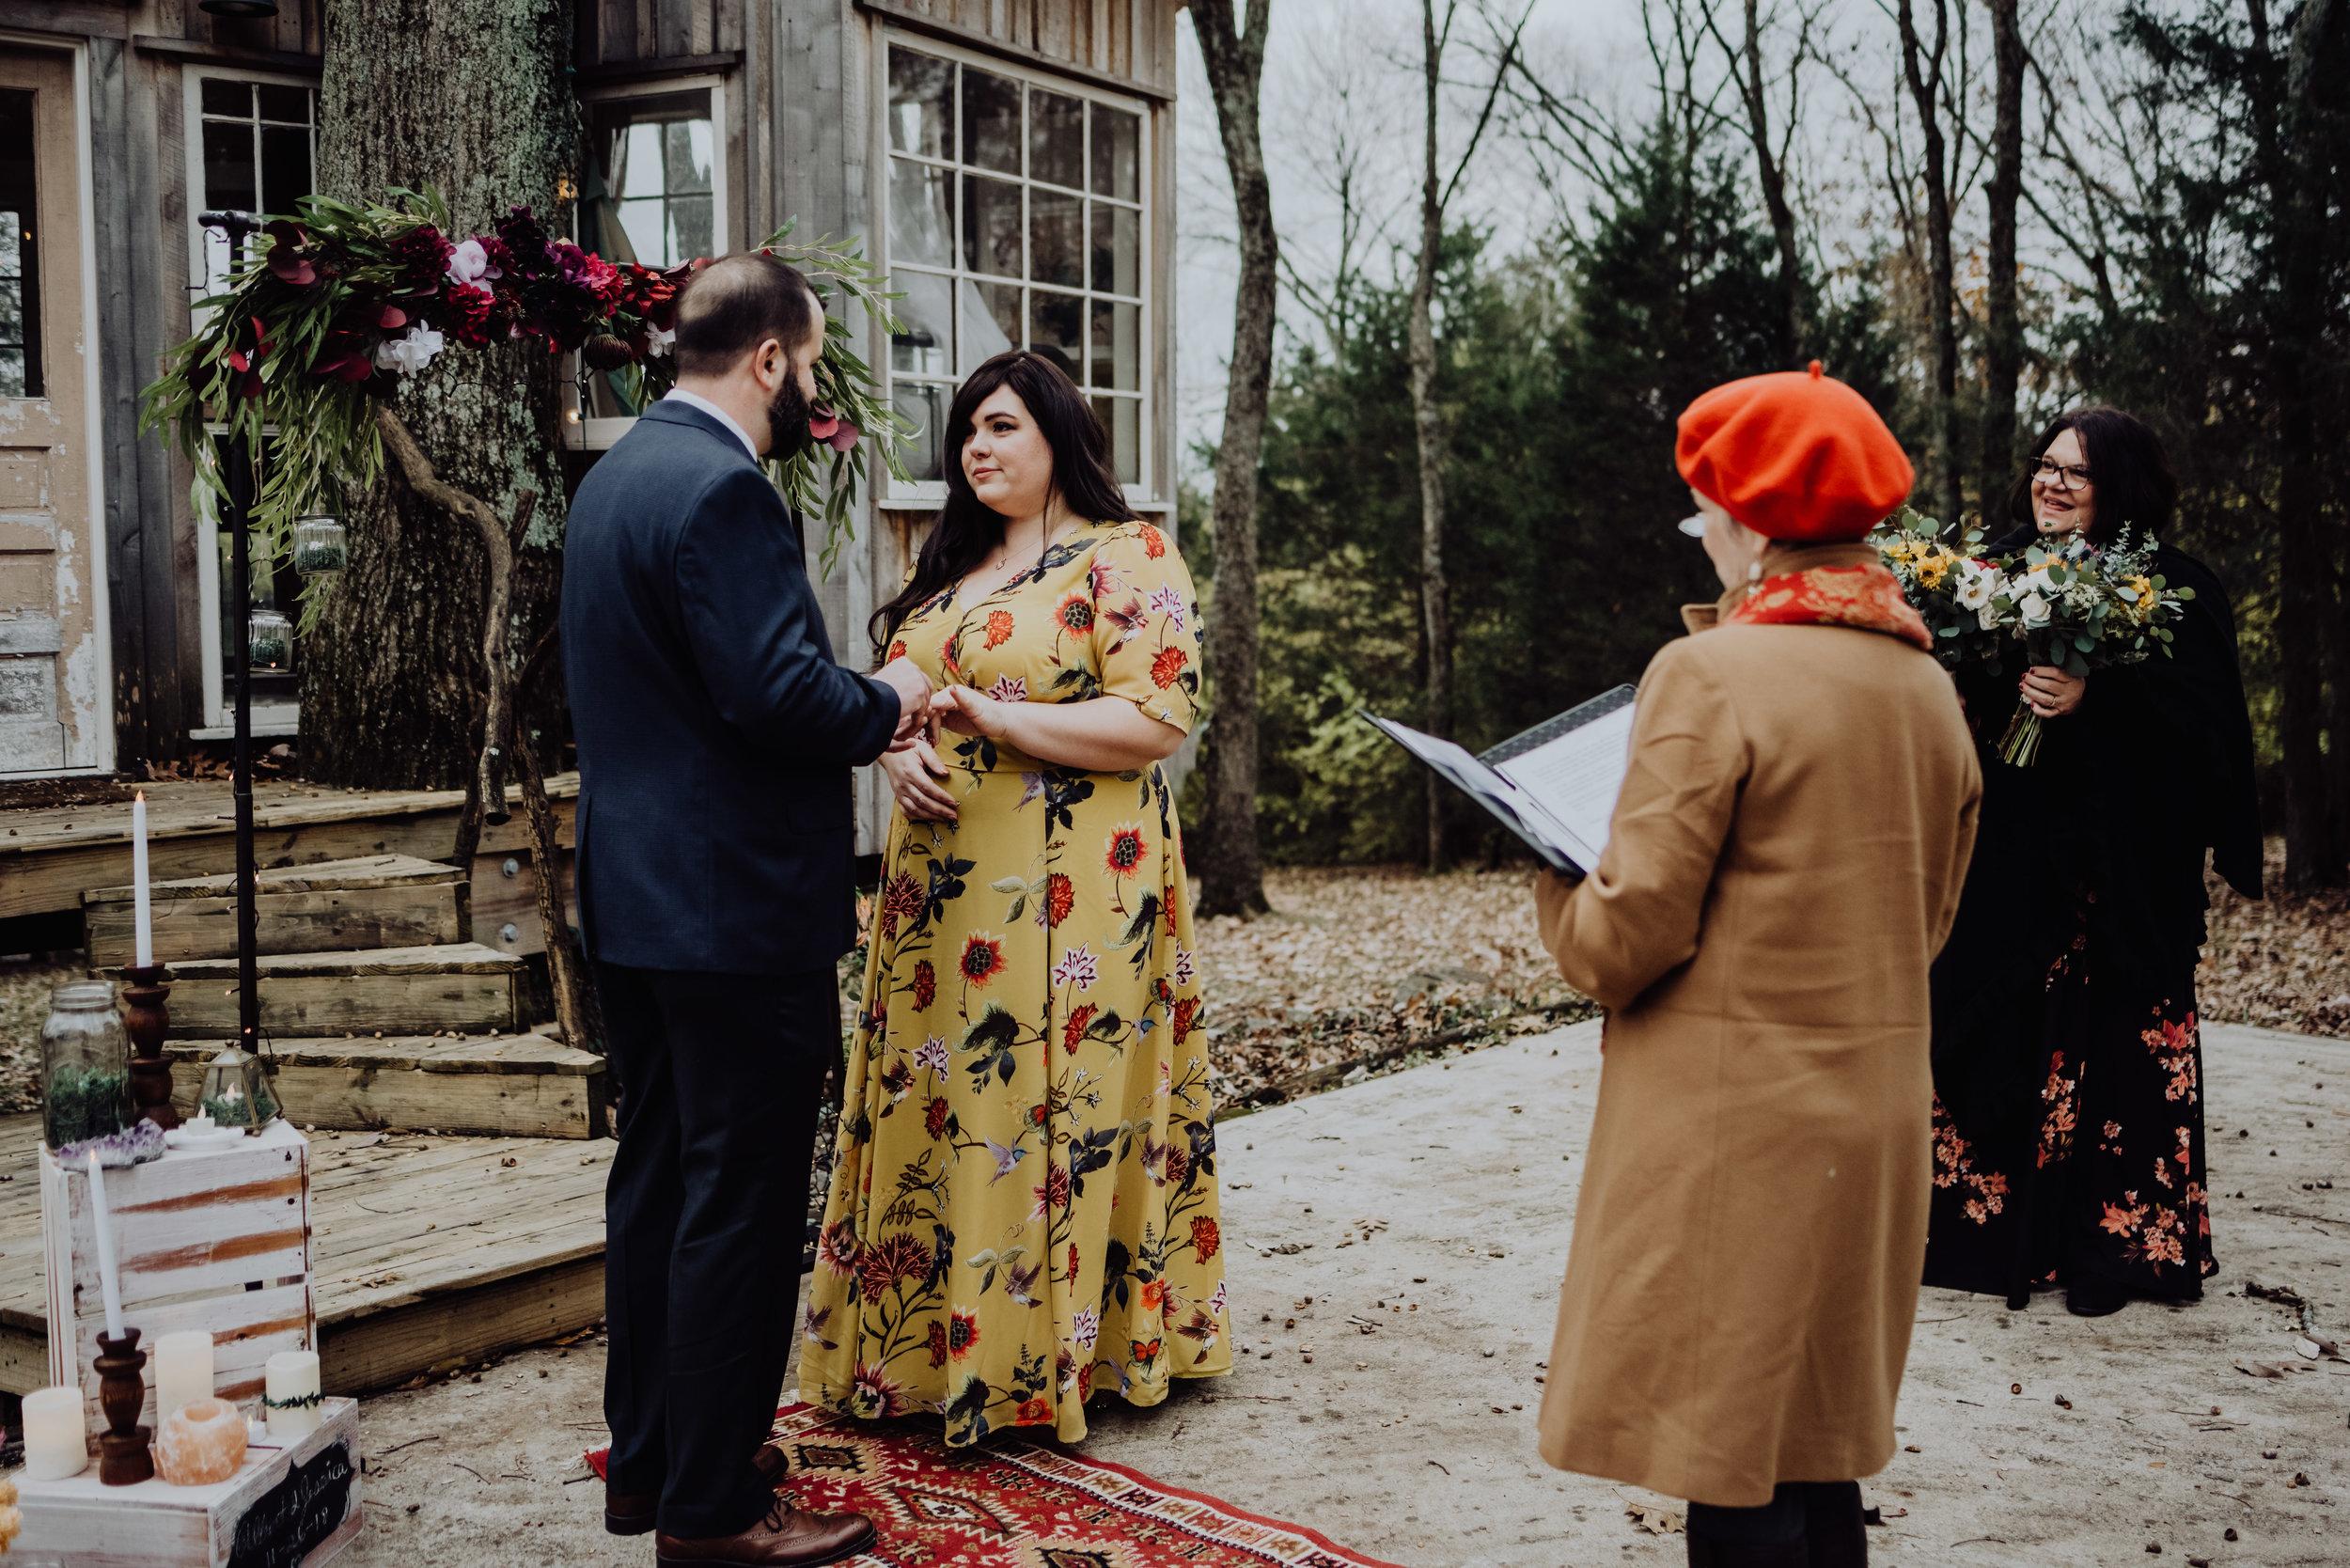 jessica and albert tn treehouse elopement wilde company-5940-Edit.jpg